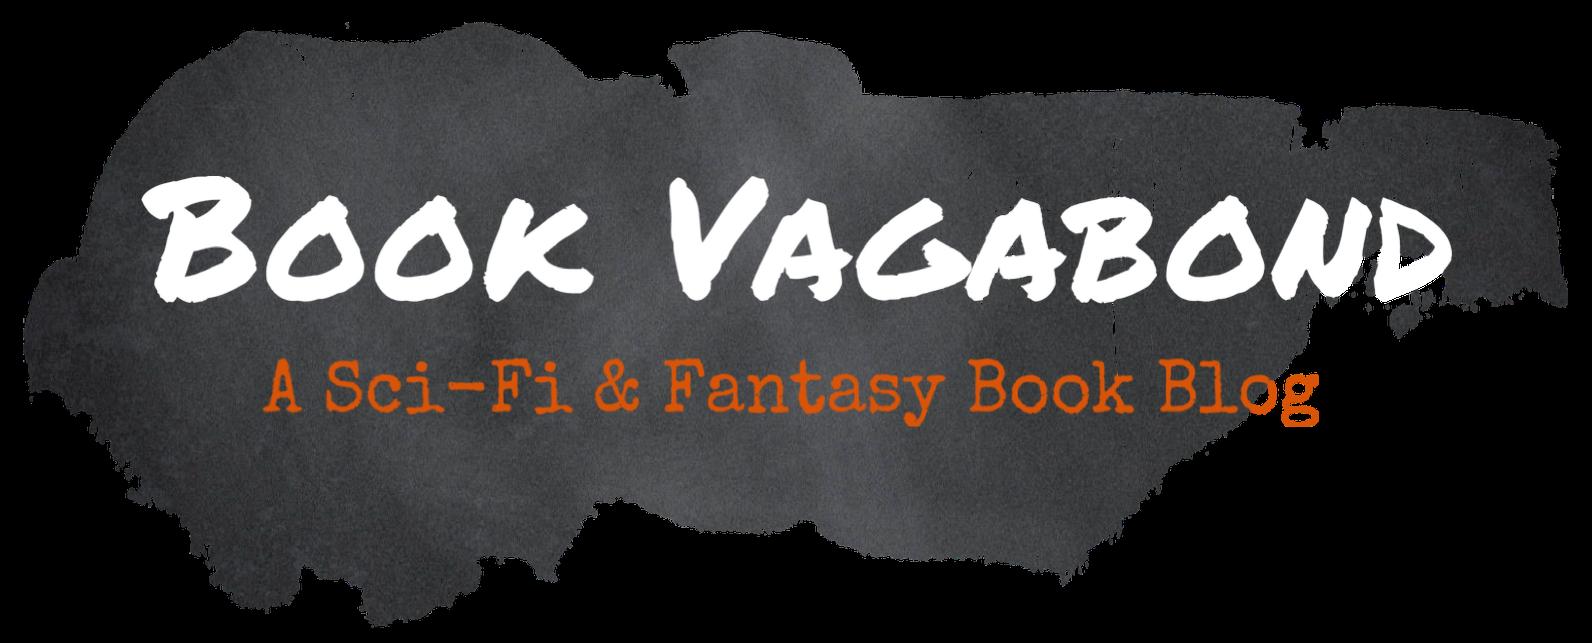 Book Vagabond